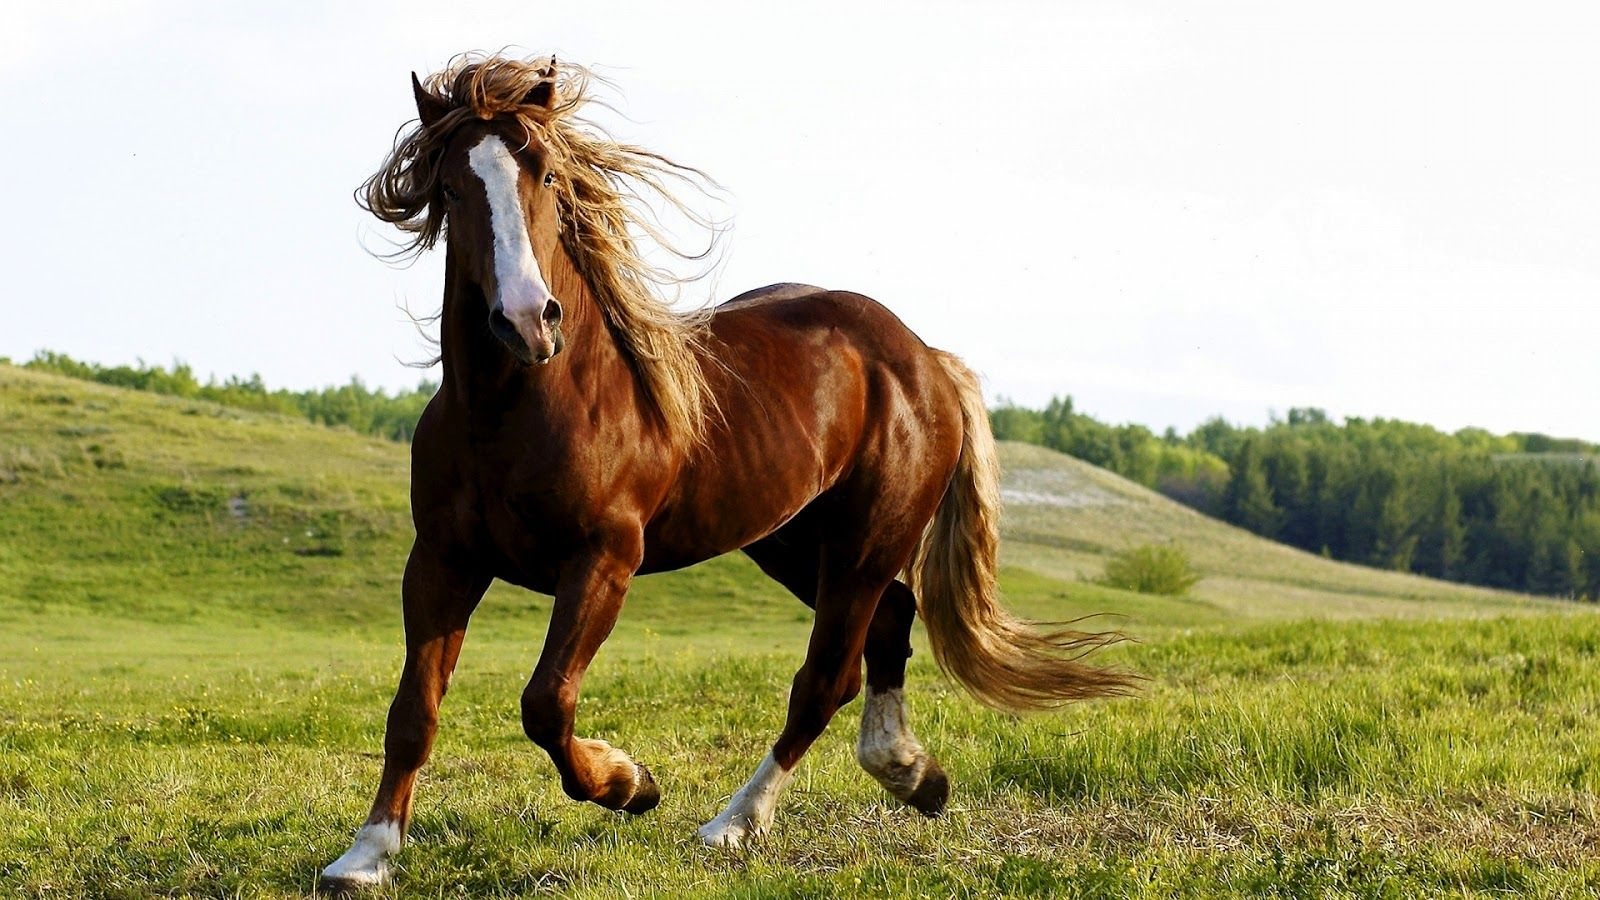 Fantastic Wallpaper Horse High Definition - f93dad440105784243b6035058fc011e  HD_693249.jpg